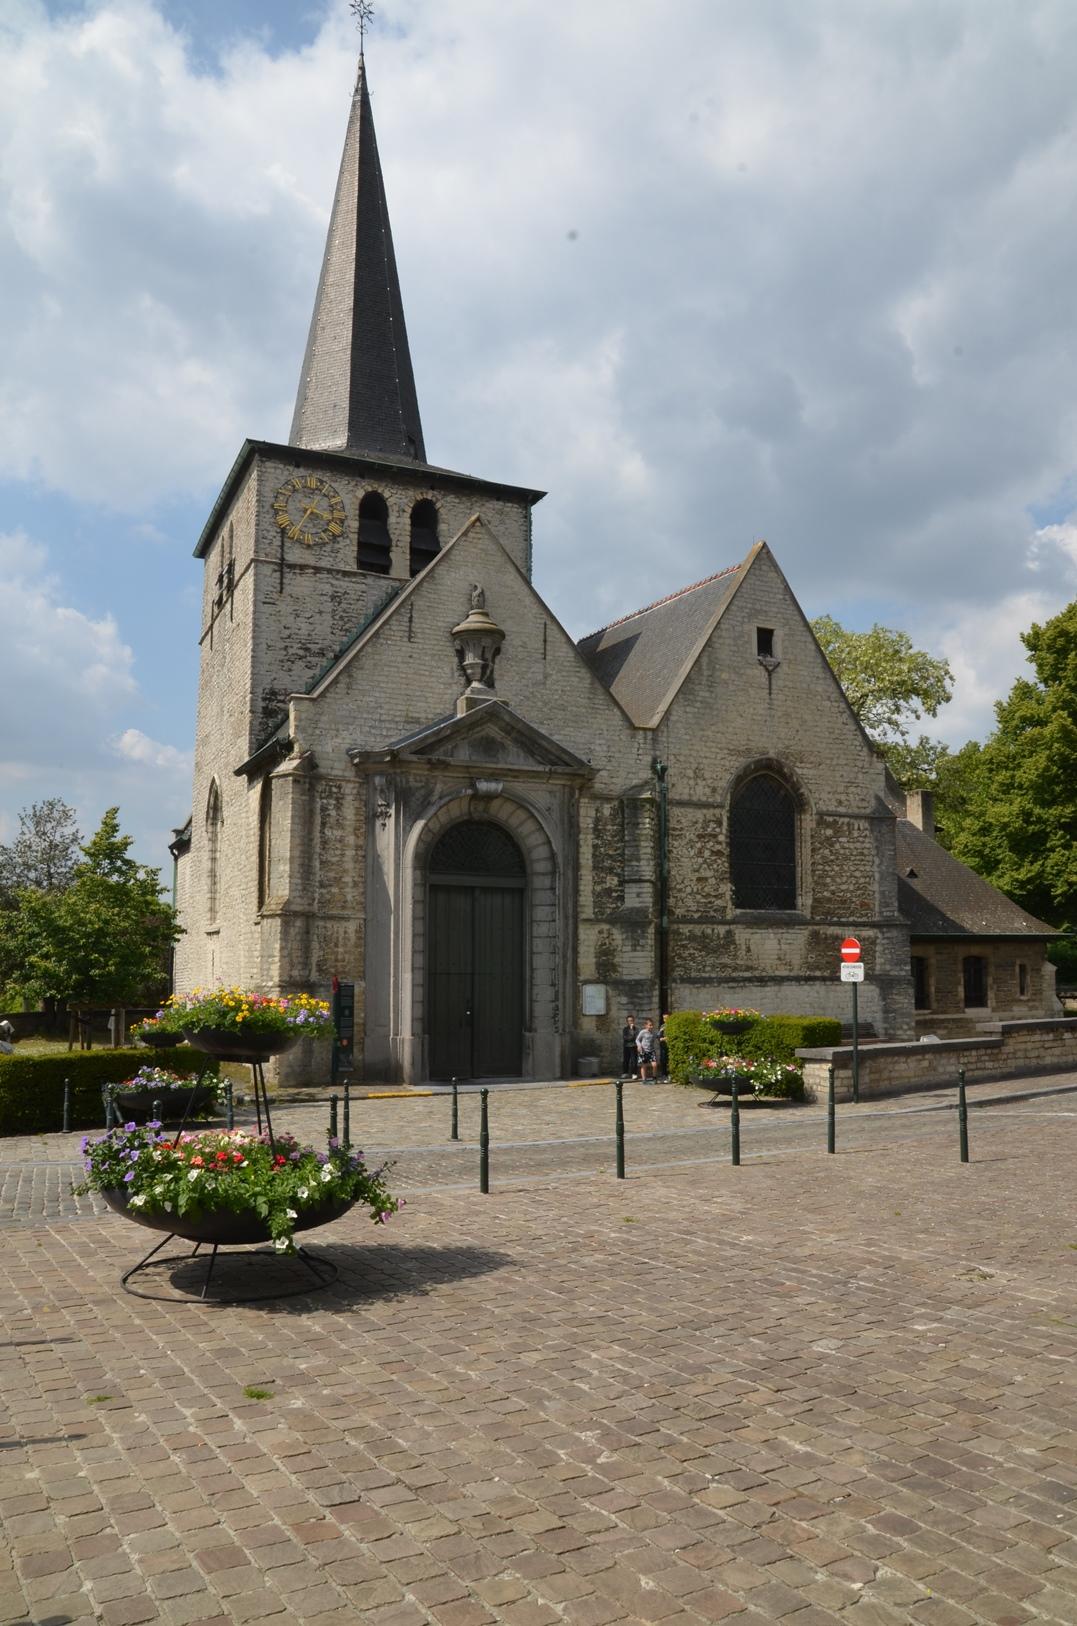 Kortenbachstraat, Sint-Elisabethkerk